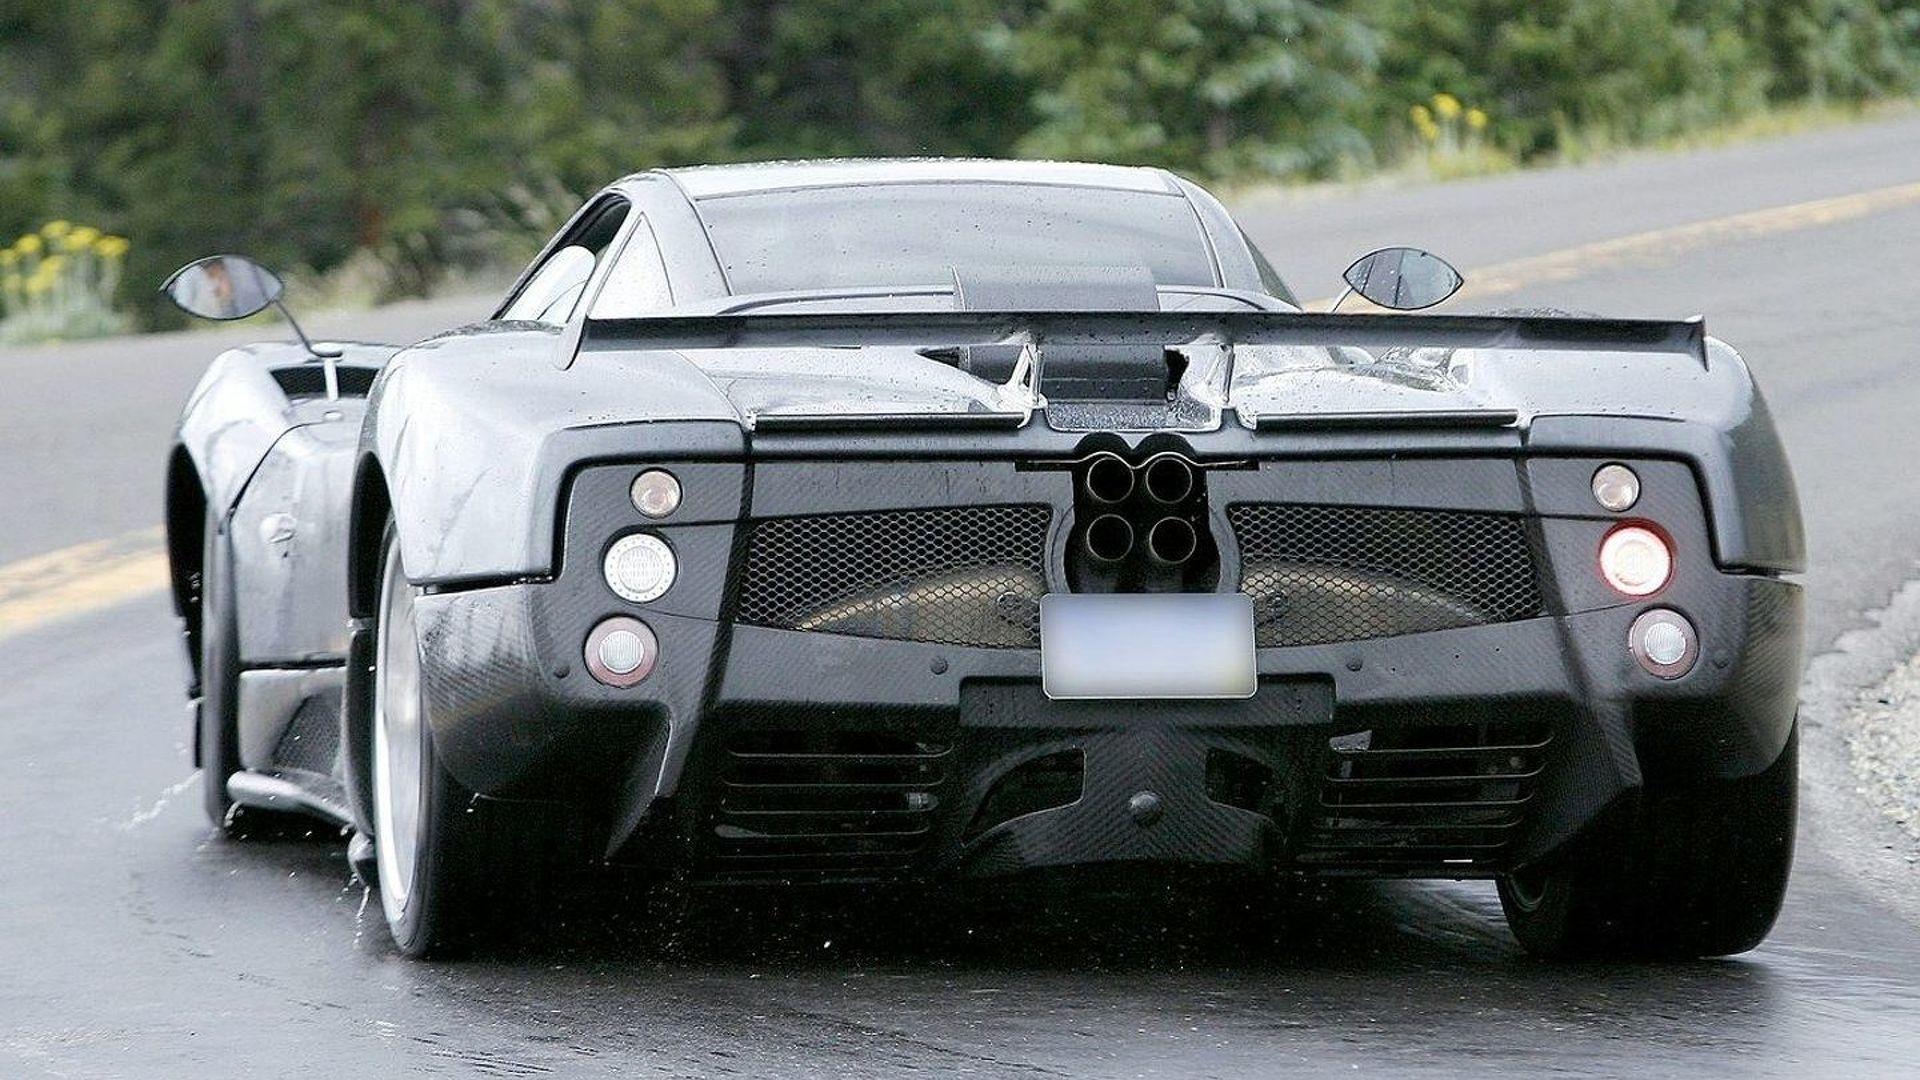 Pagani C9 Next Generation Supercar Details Revealed - Price 900,000